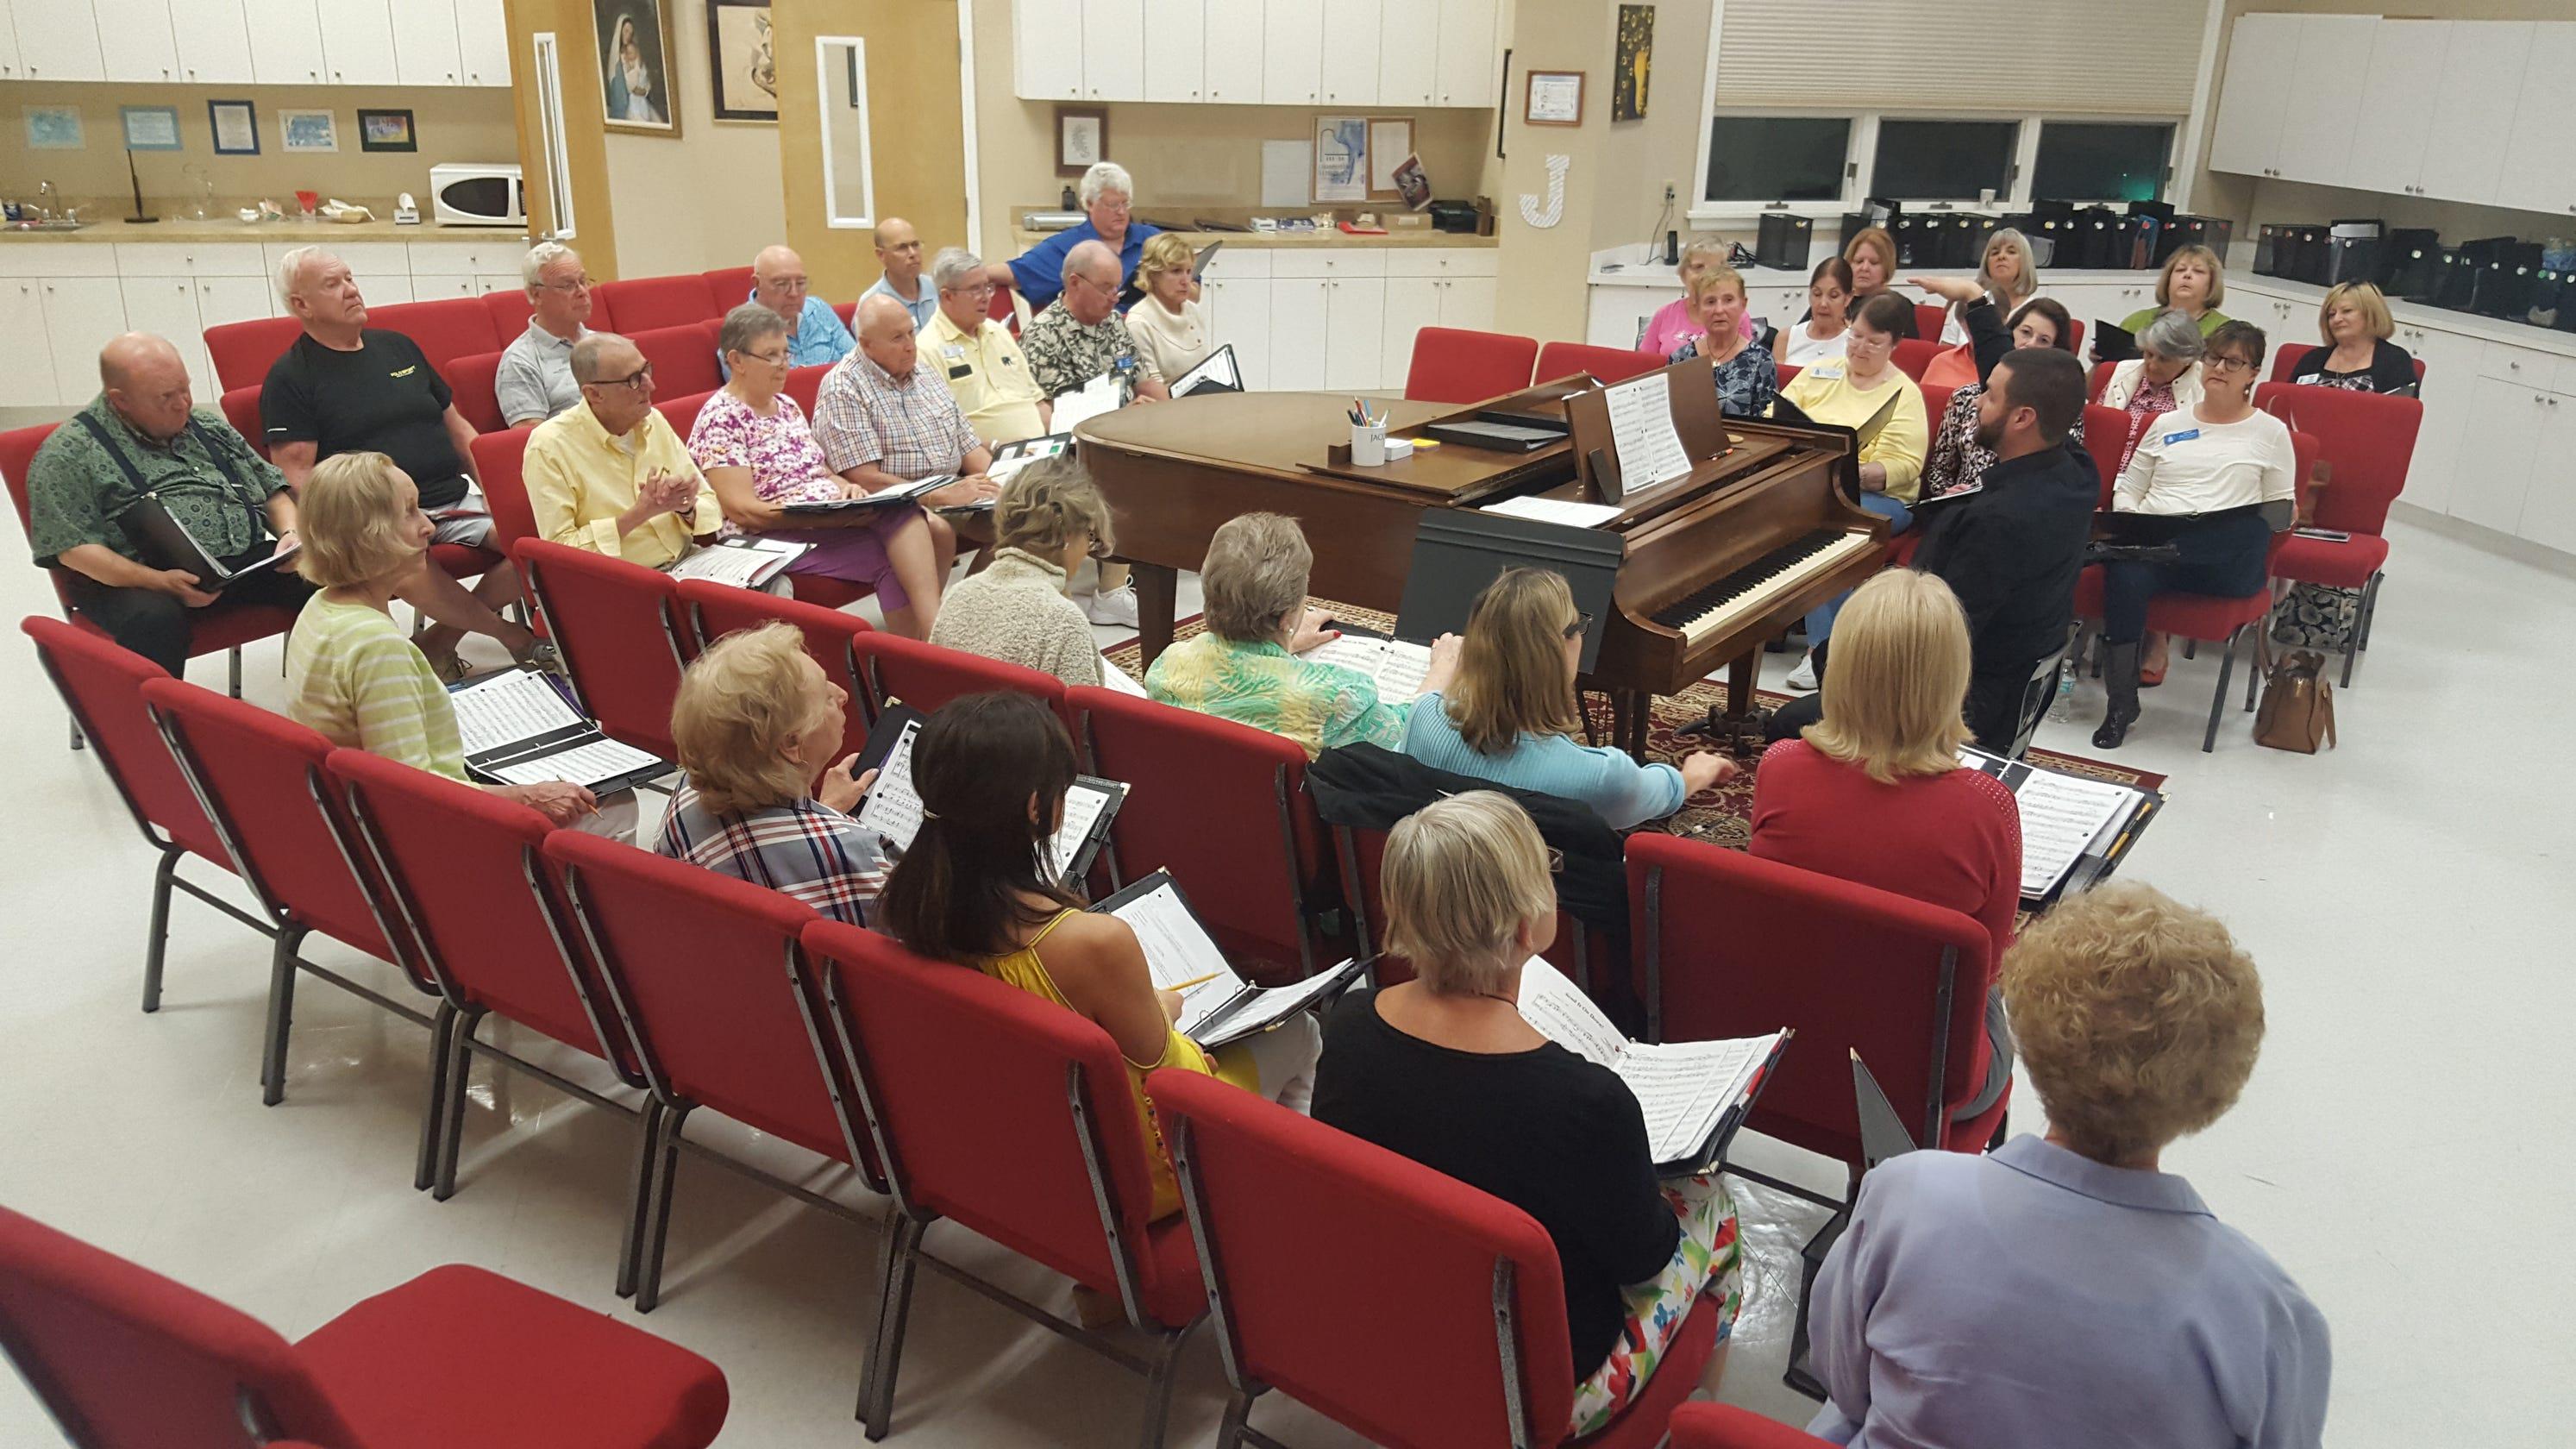 First Presbyterian Church to present 'Appalachian Winter,' a Christmas cantata on Dec. 23